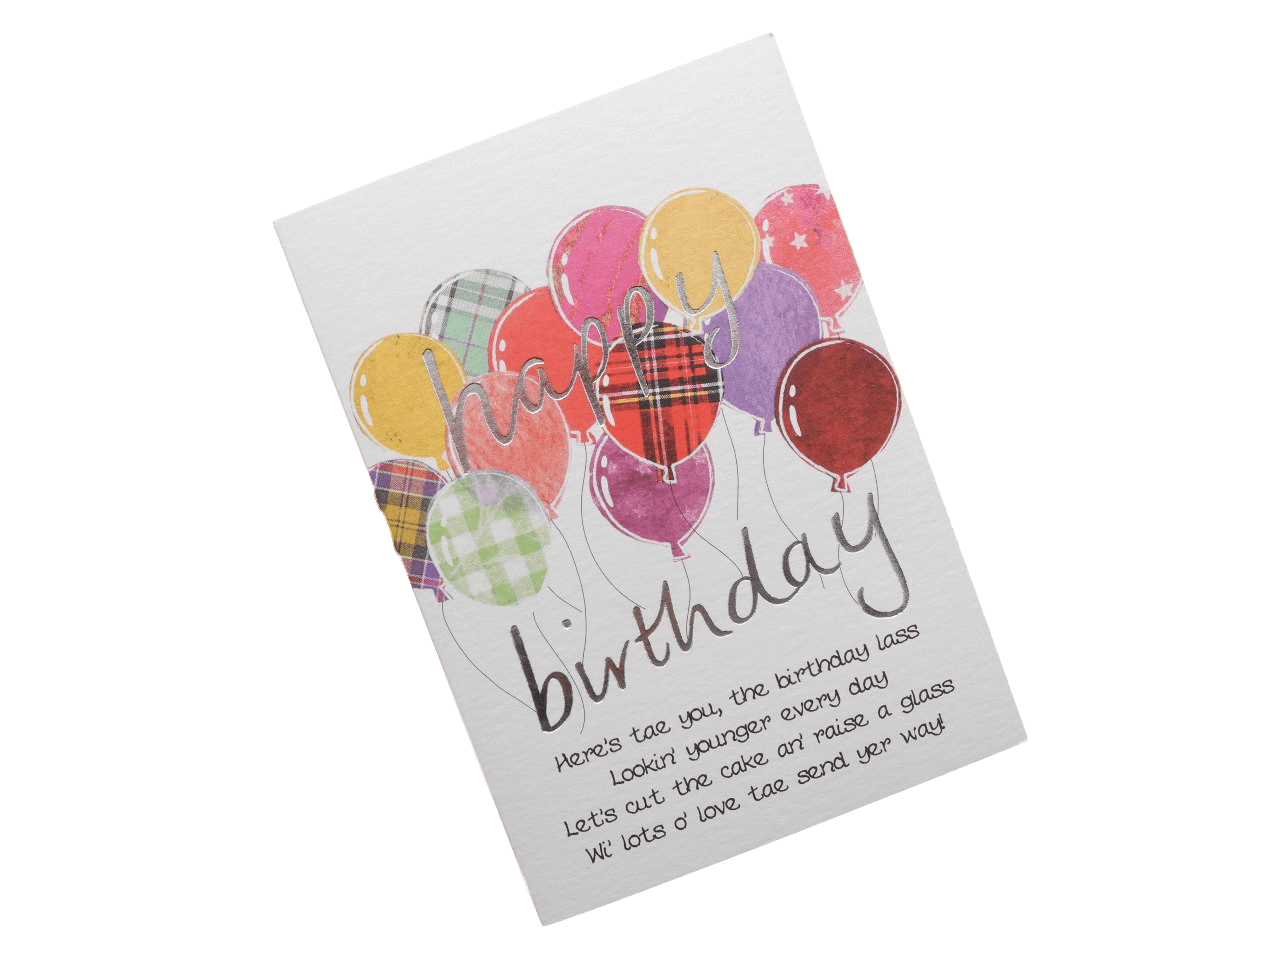 scottish birthday card female tartan balloons pink doric scots language